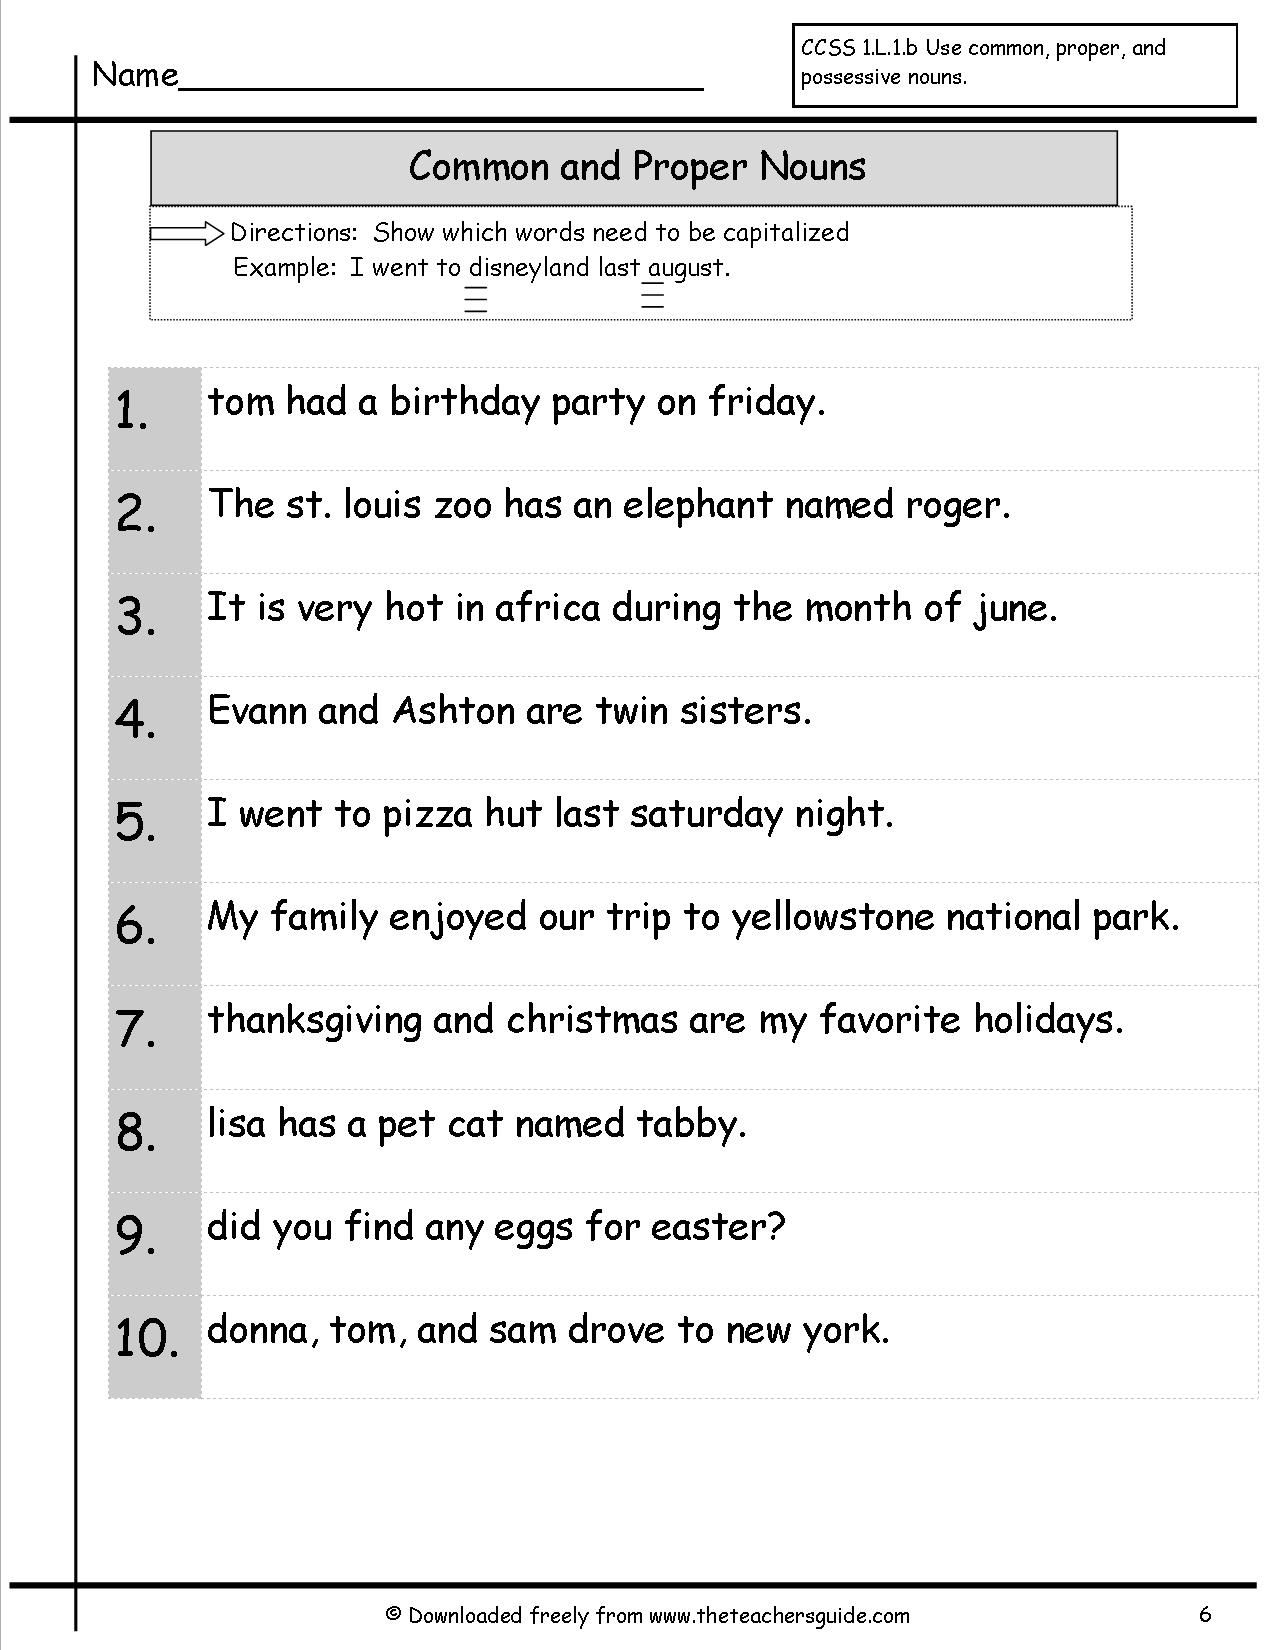 hight resolution of https://dubaikhalifas.com/nouns-common-nouns-proper-nouns-worksheets-for-grade-1-2-google-classroom/